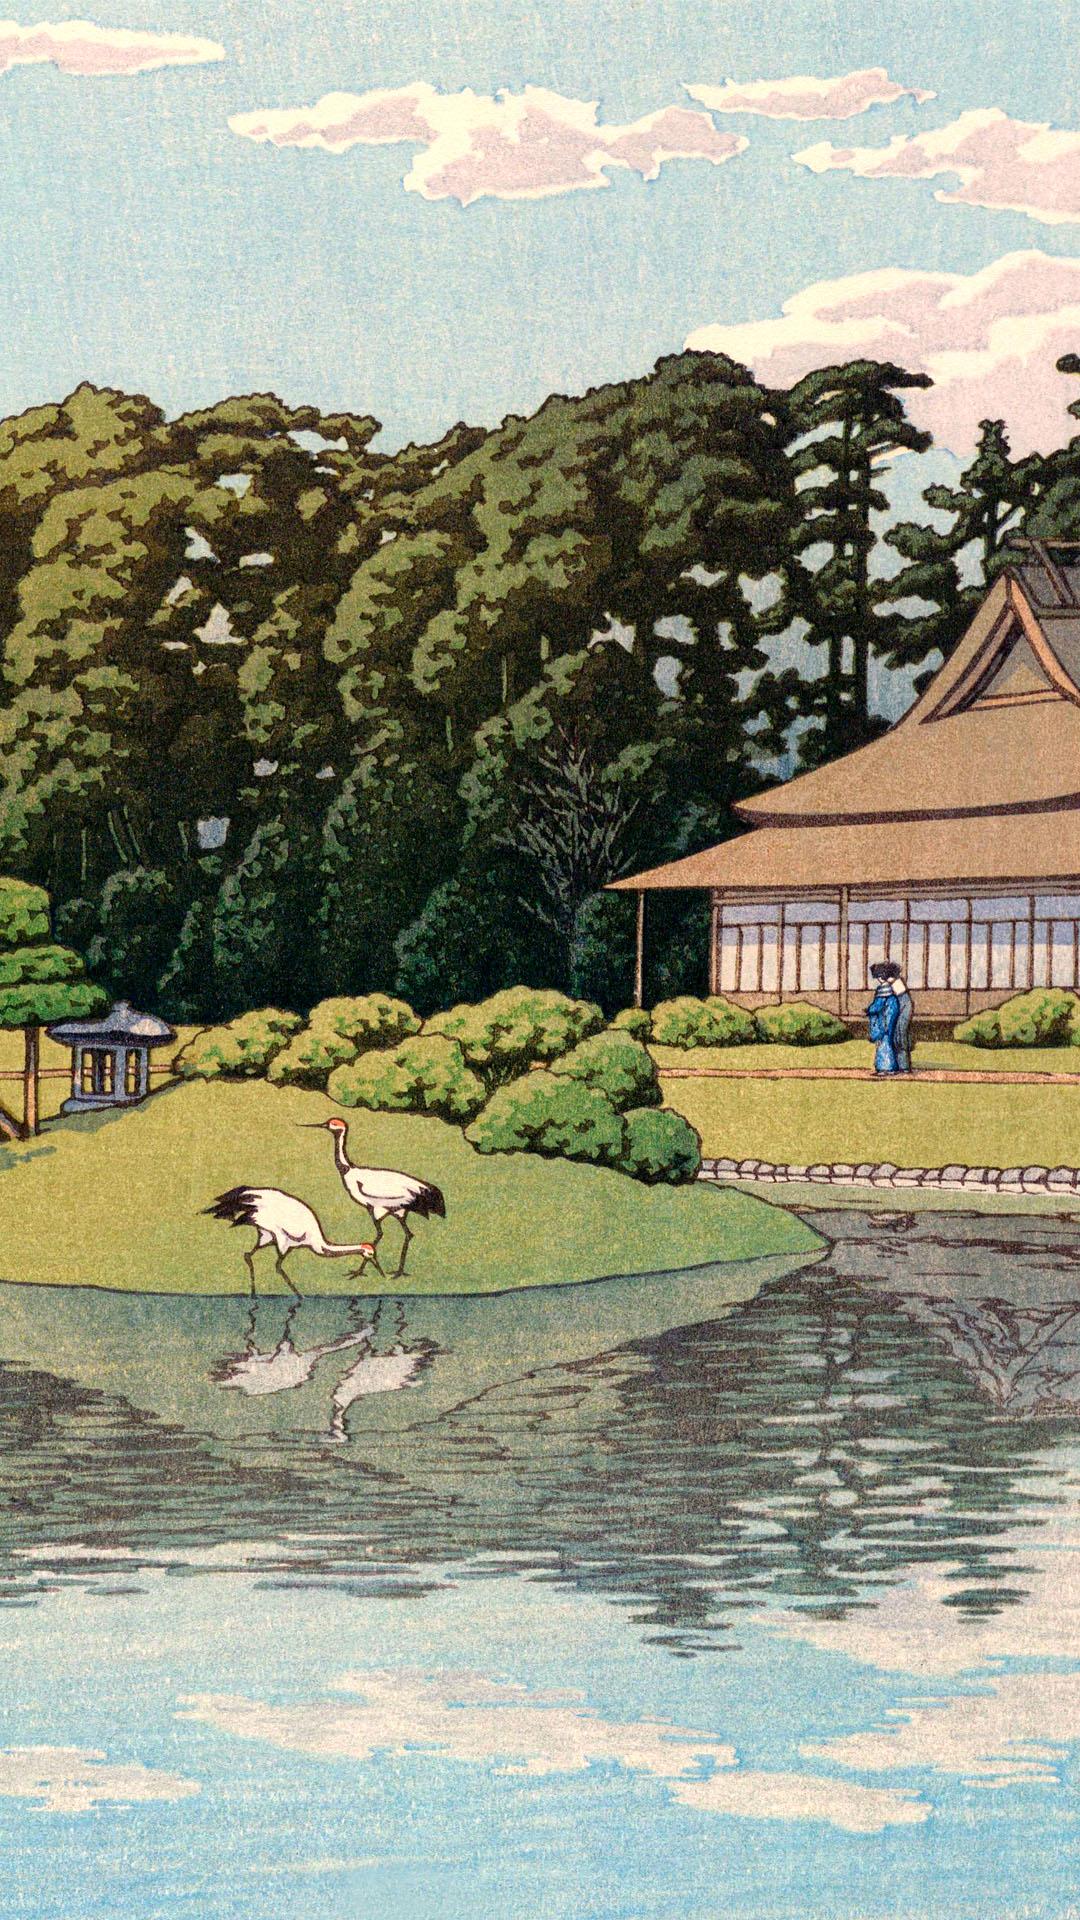 川瀬巴水 岡山後楽園 Kawase Hasui - Okayama korakuen 1080x1920